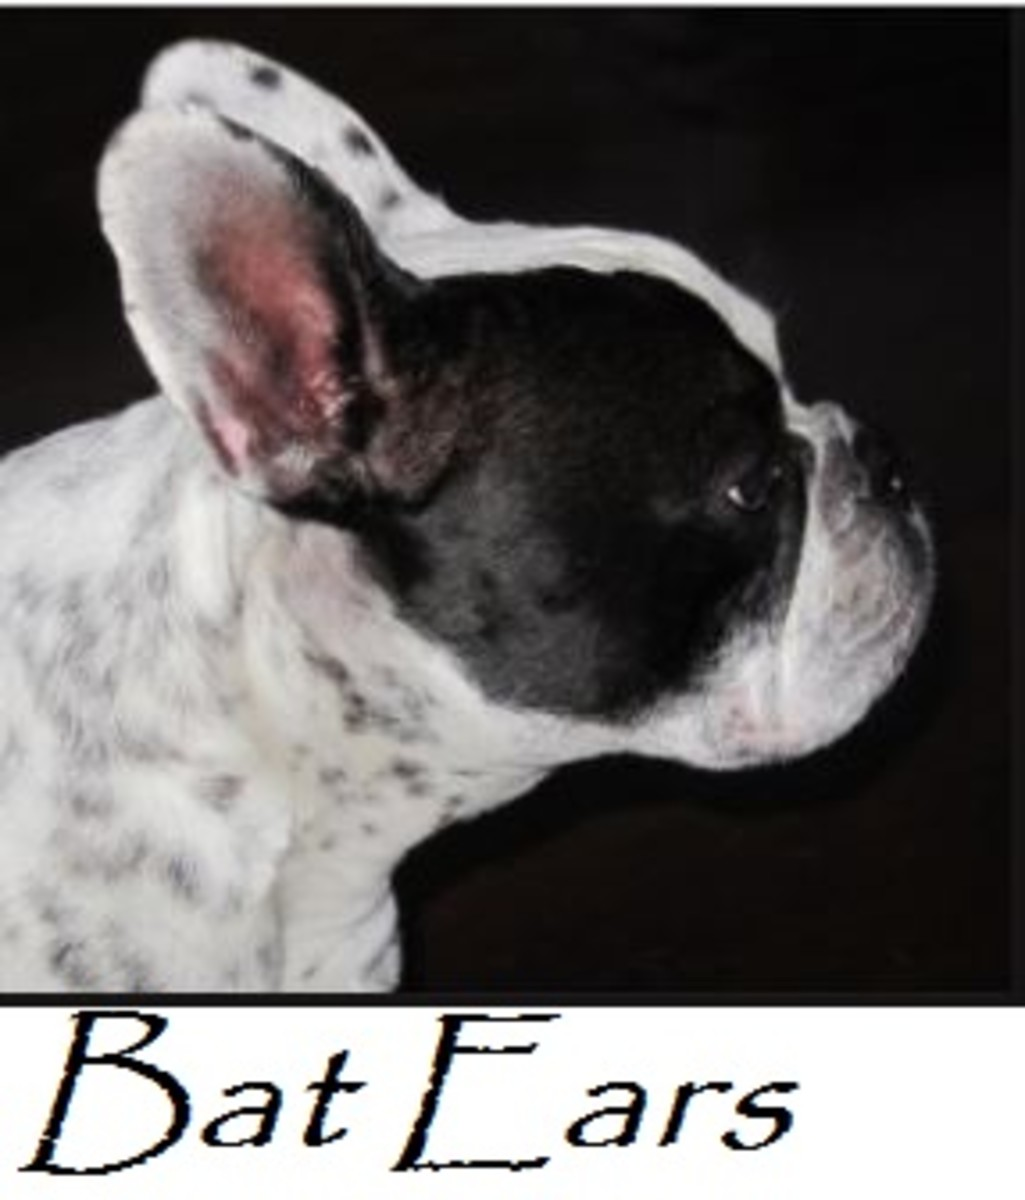 bat ears